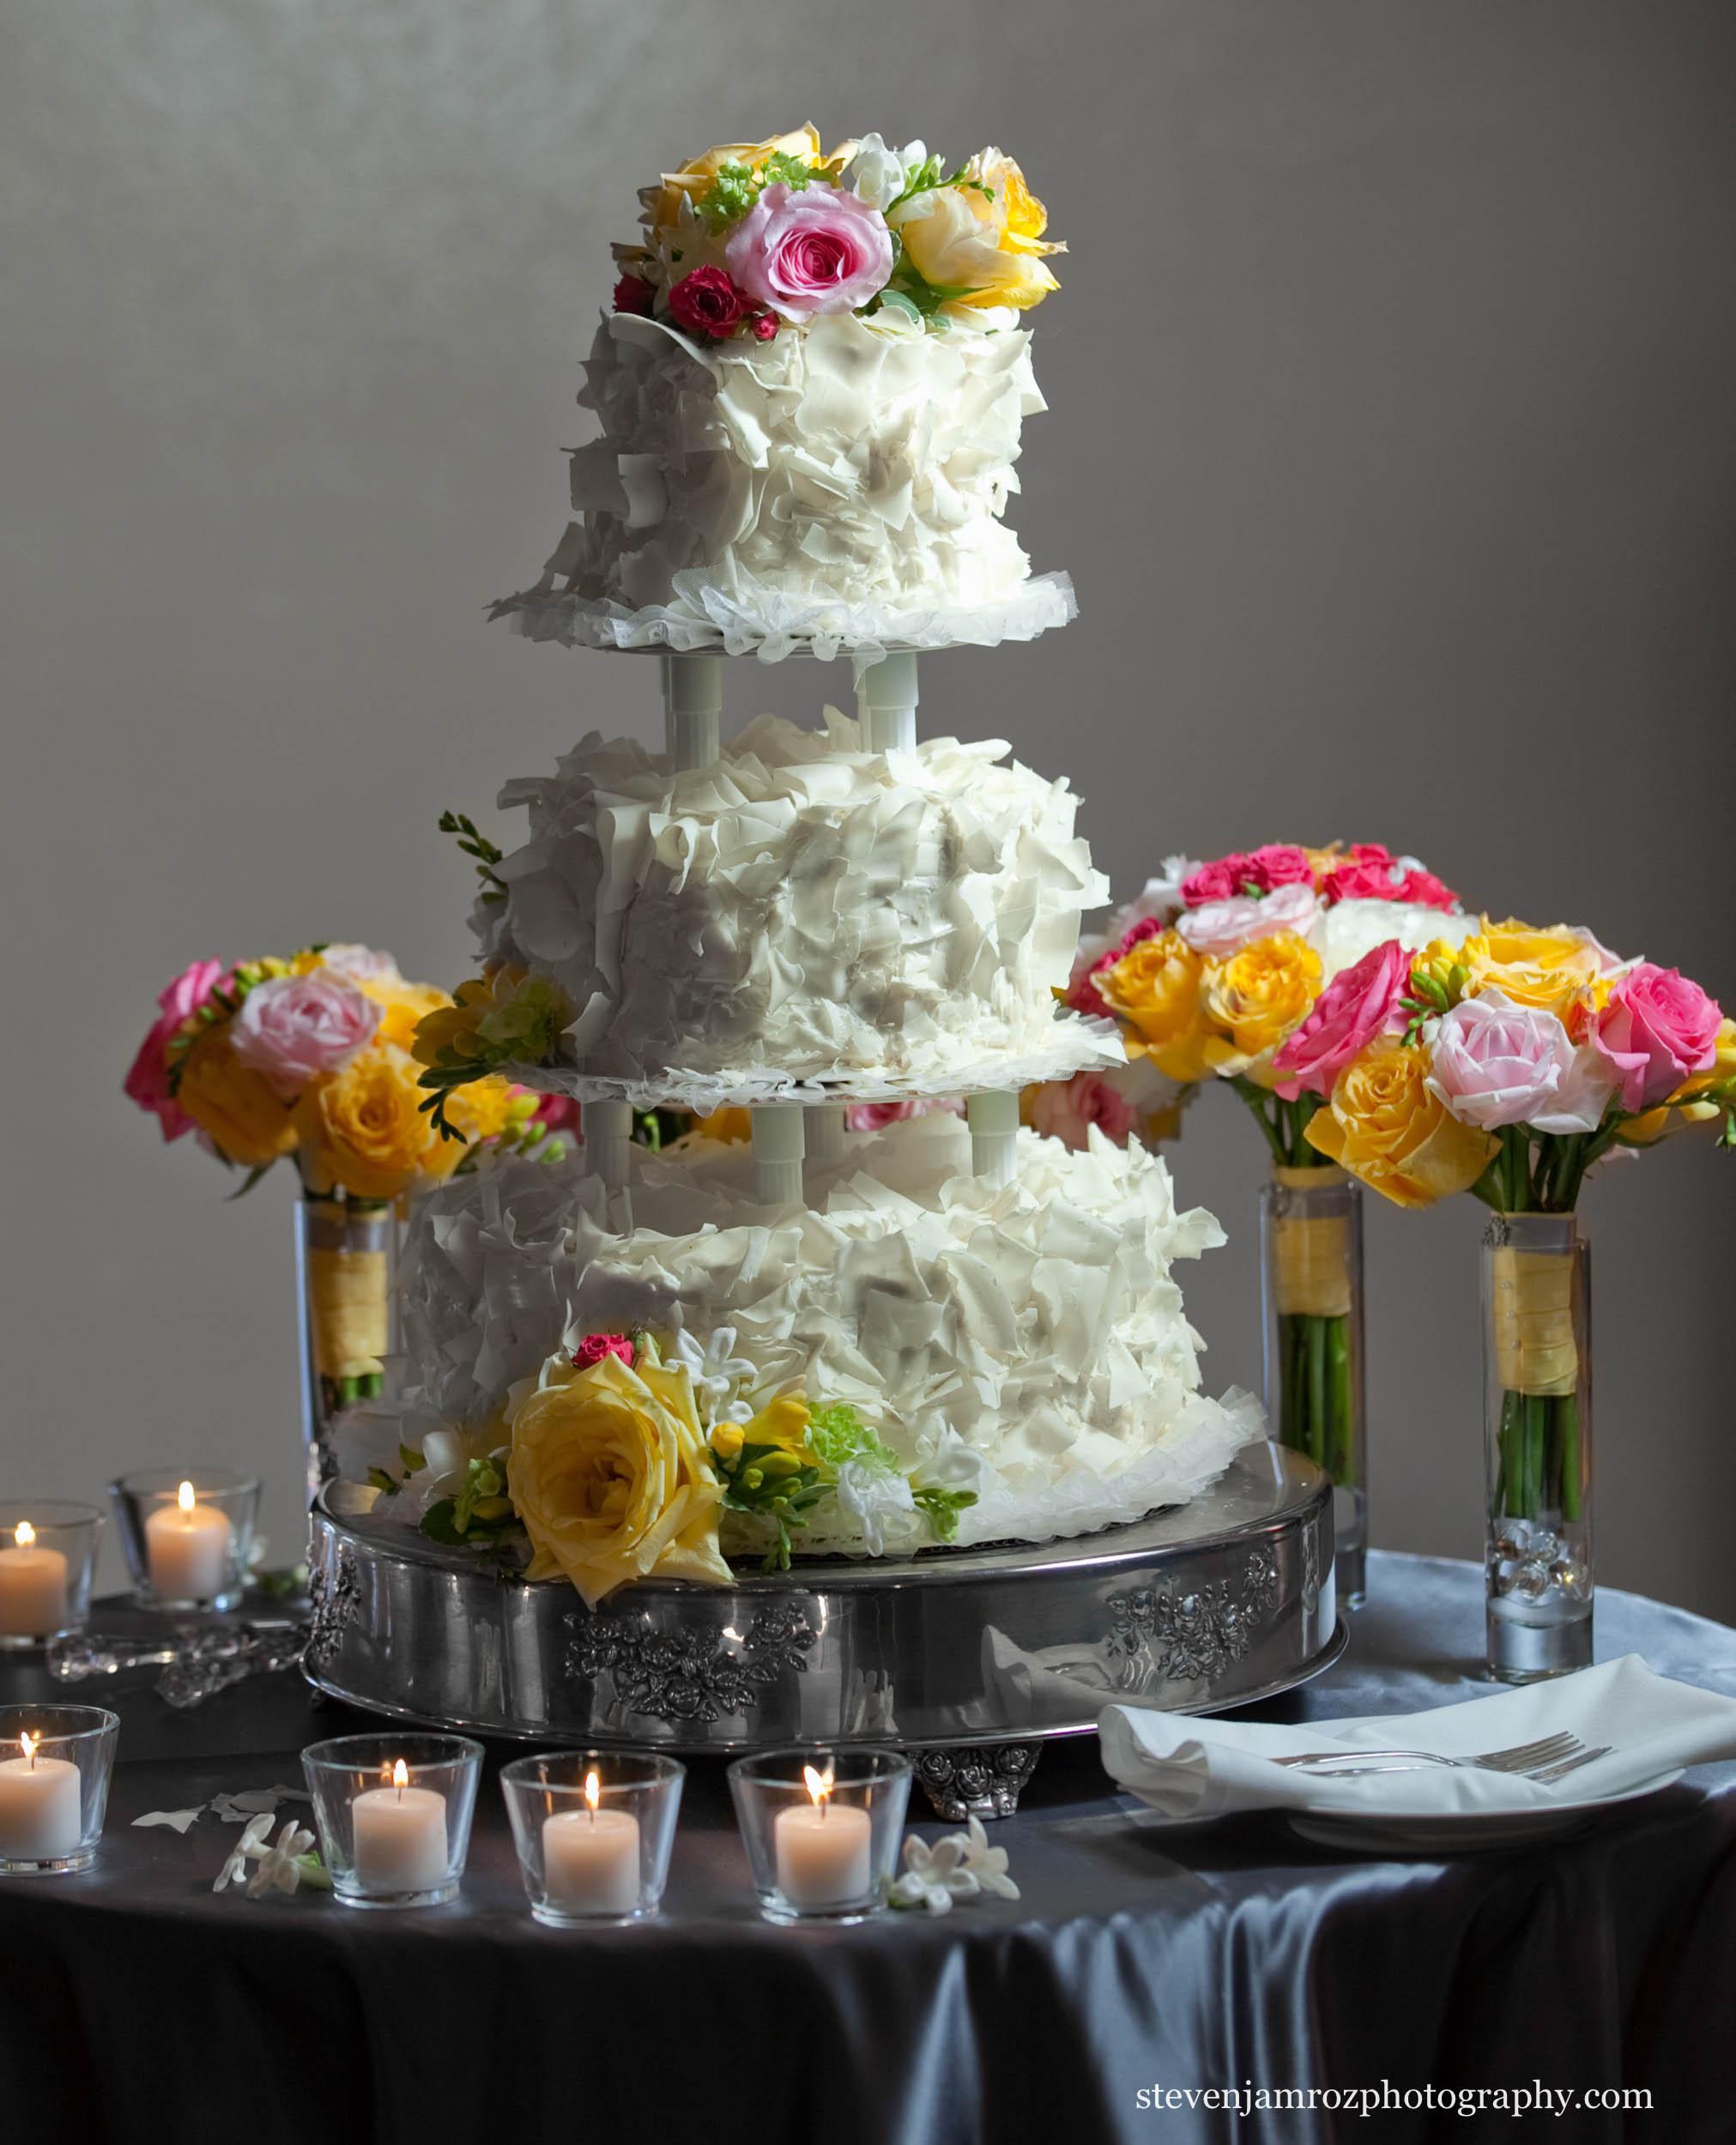 flowers-and-wedding-cake-raleigh-nc-steven-jamroz-photography-0403.jpg